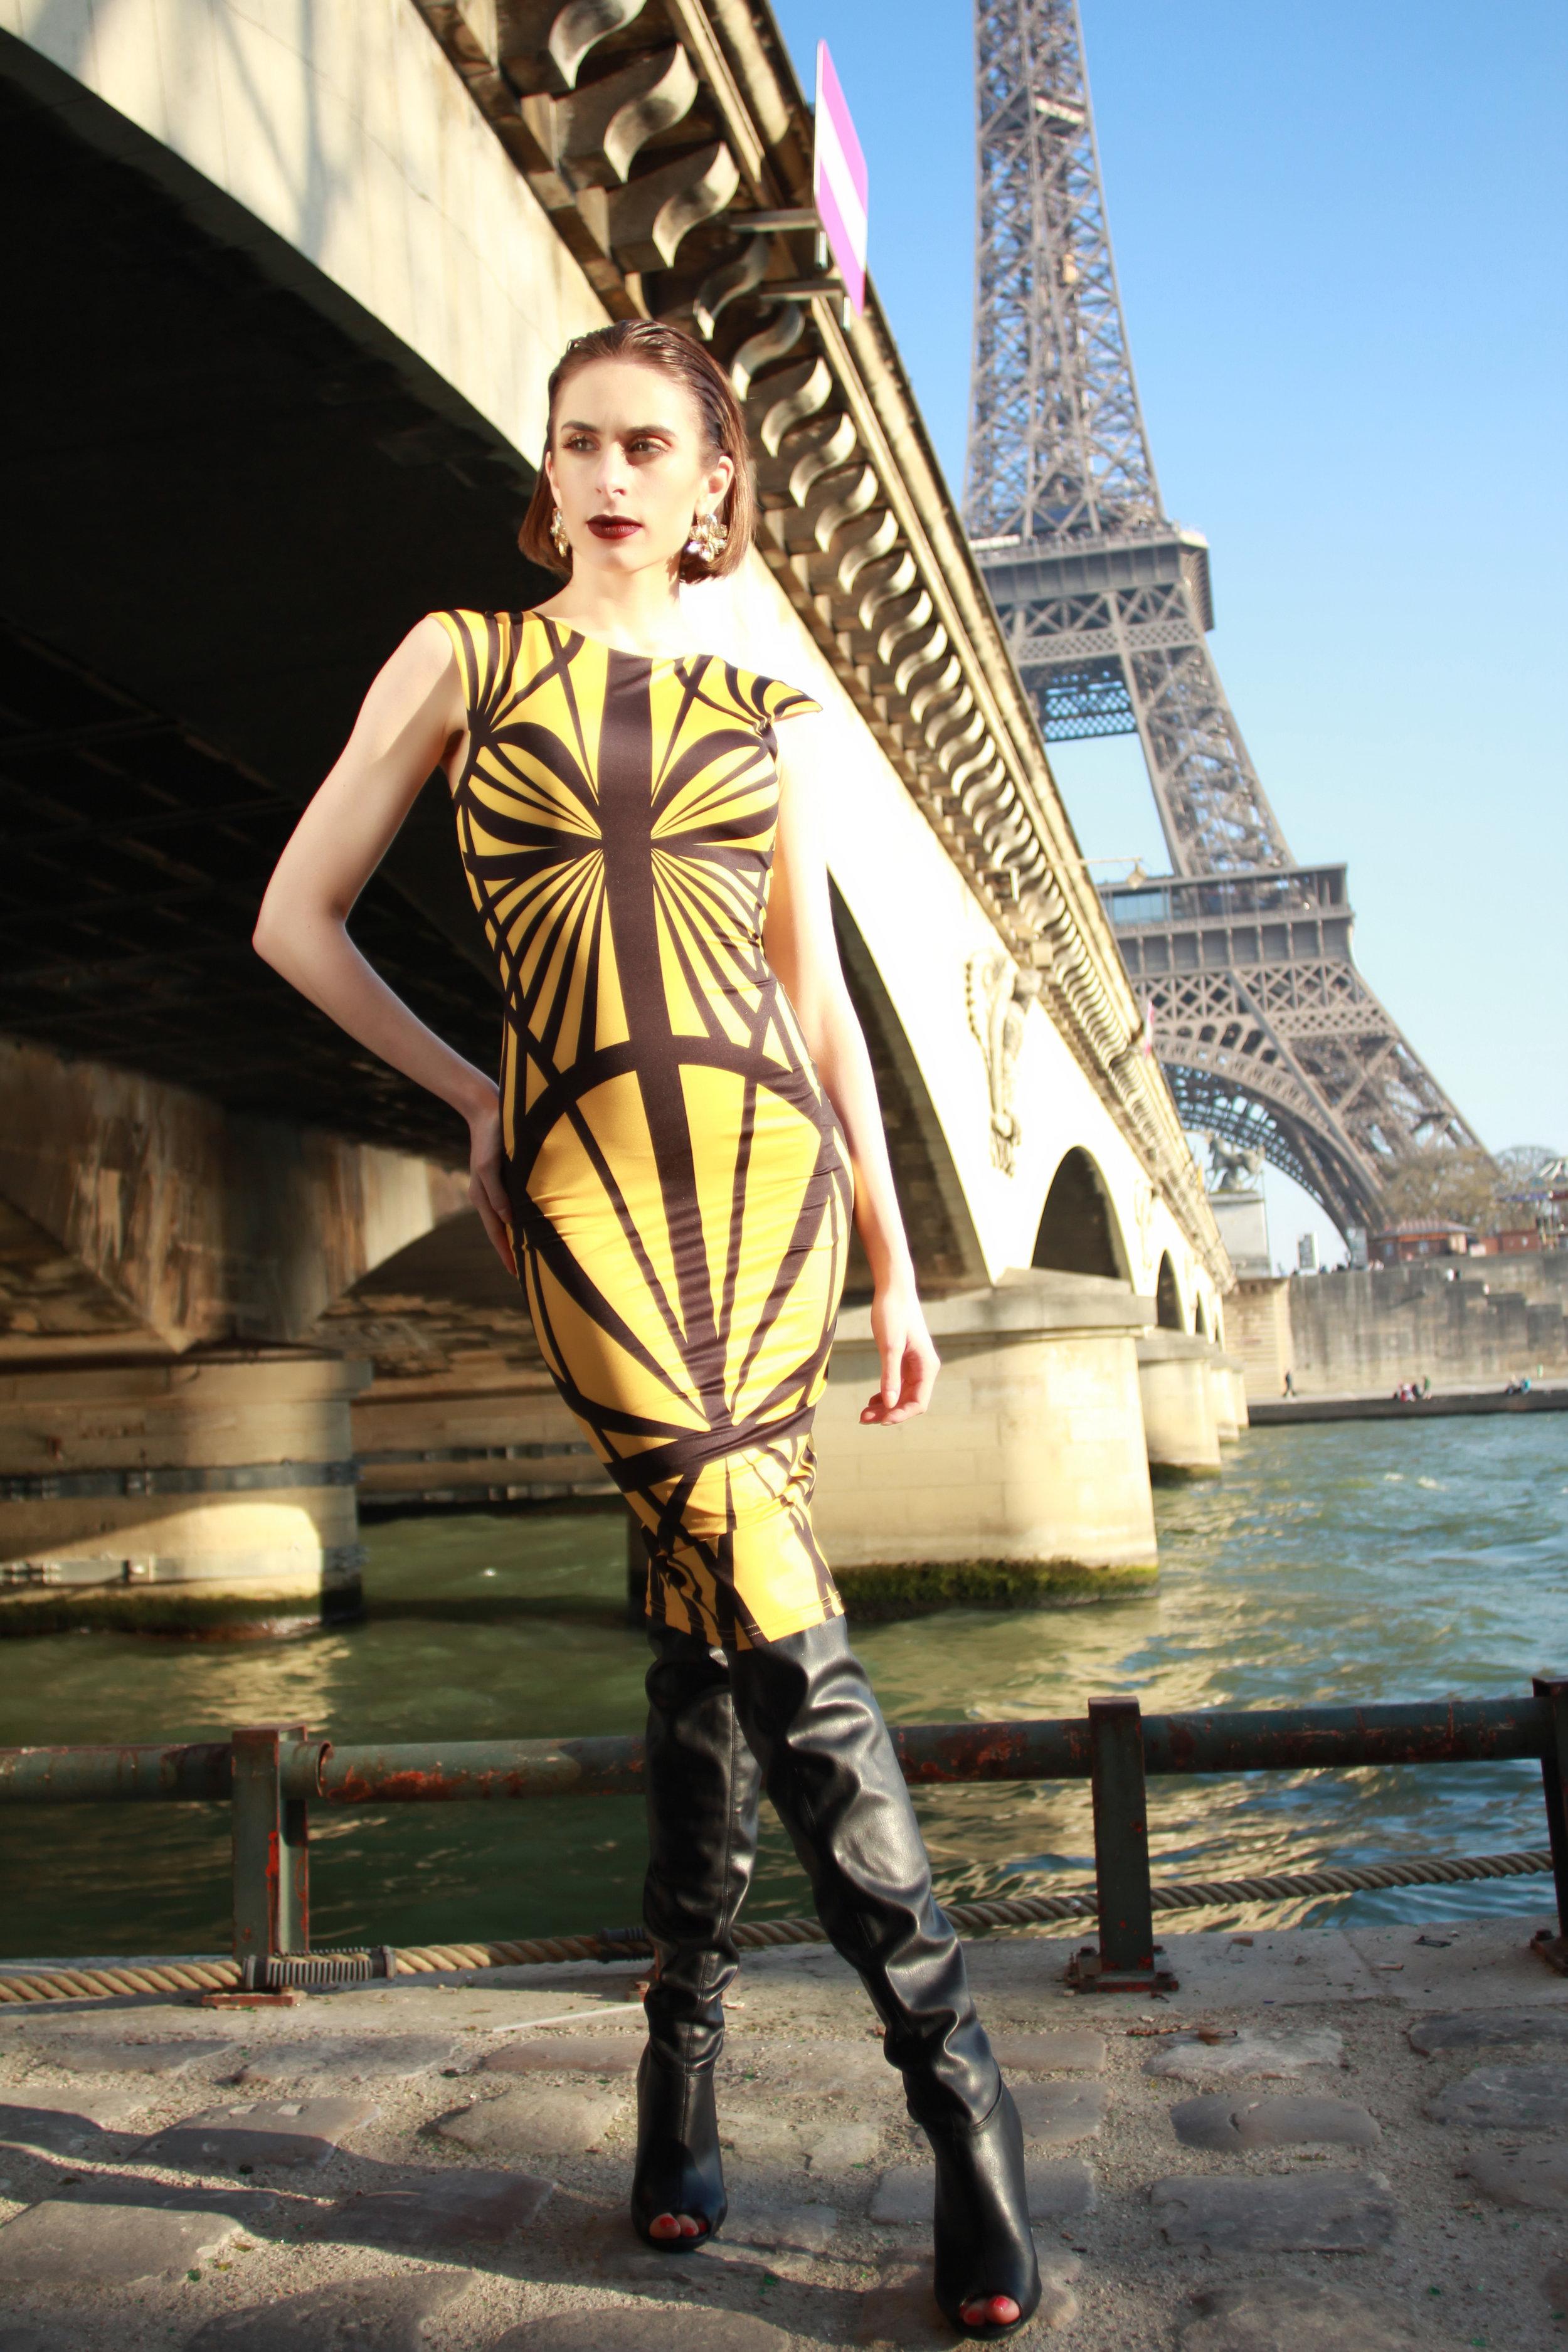 Dress : Immortel Couture Paris  Boots : Guiseppe Zanotti  Earrings : Oscar De La Renta